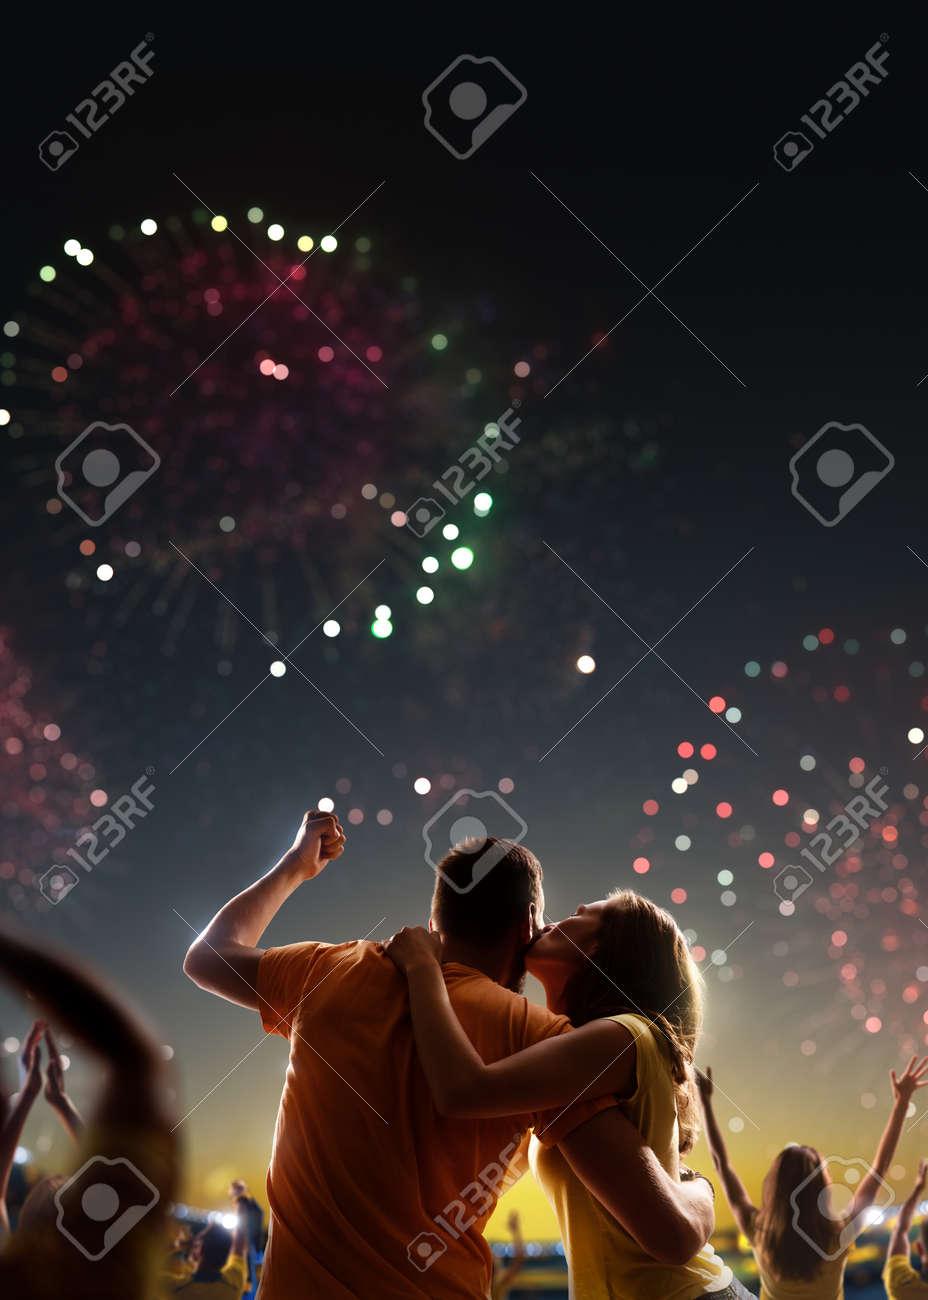 Fans celebrate in Stadium Arena night fireworks - 157252969